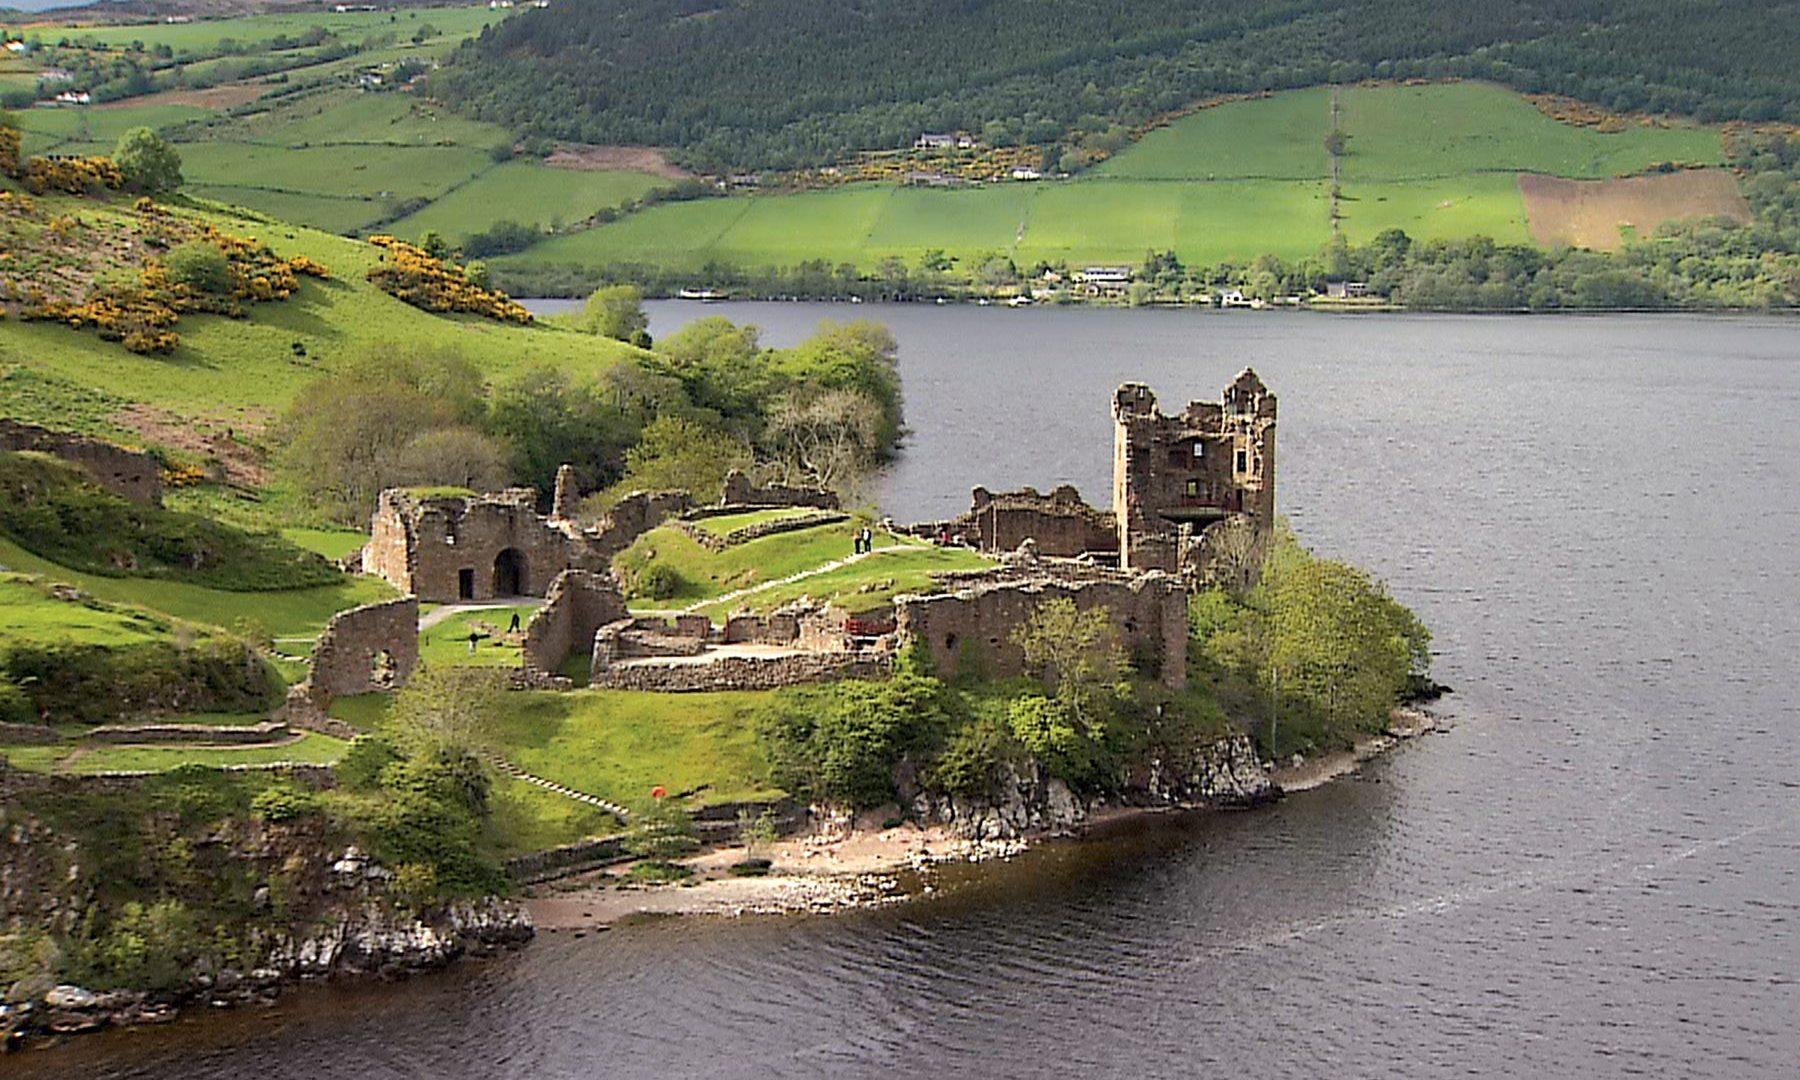 Urquhart Castle Loch Ness Scotland Highlands Castles Wallpapers